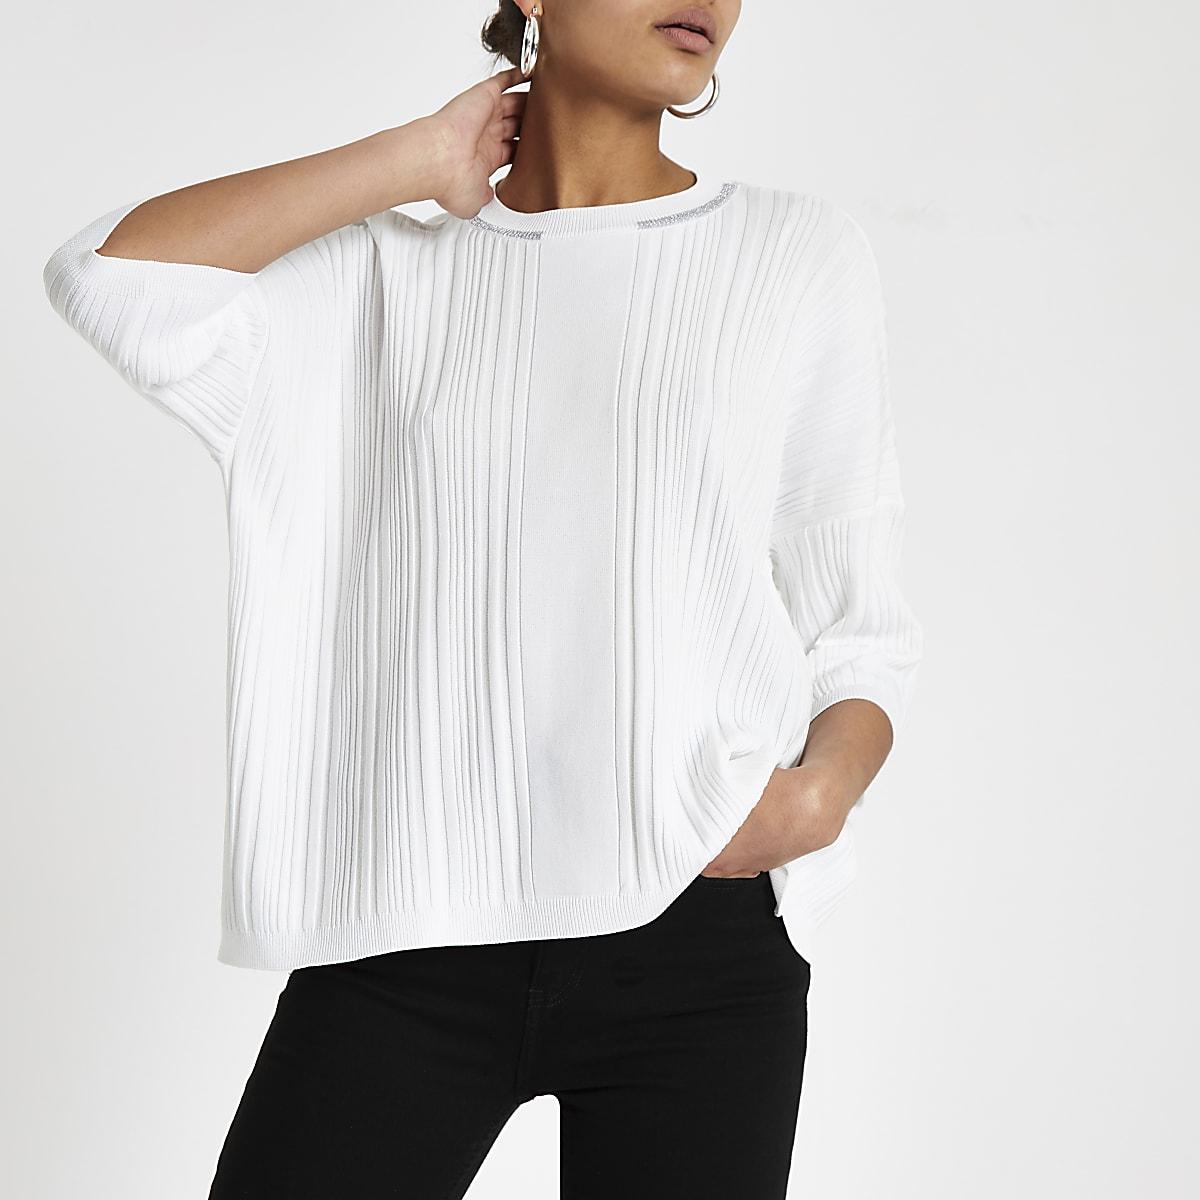 T Wit Knitwear Oversized Ronde Dames Tops Gebreide Shirt Hals Met j34RAq5L